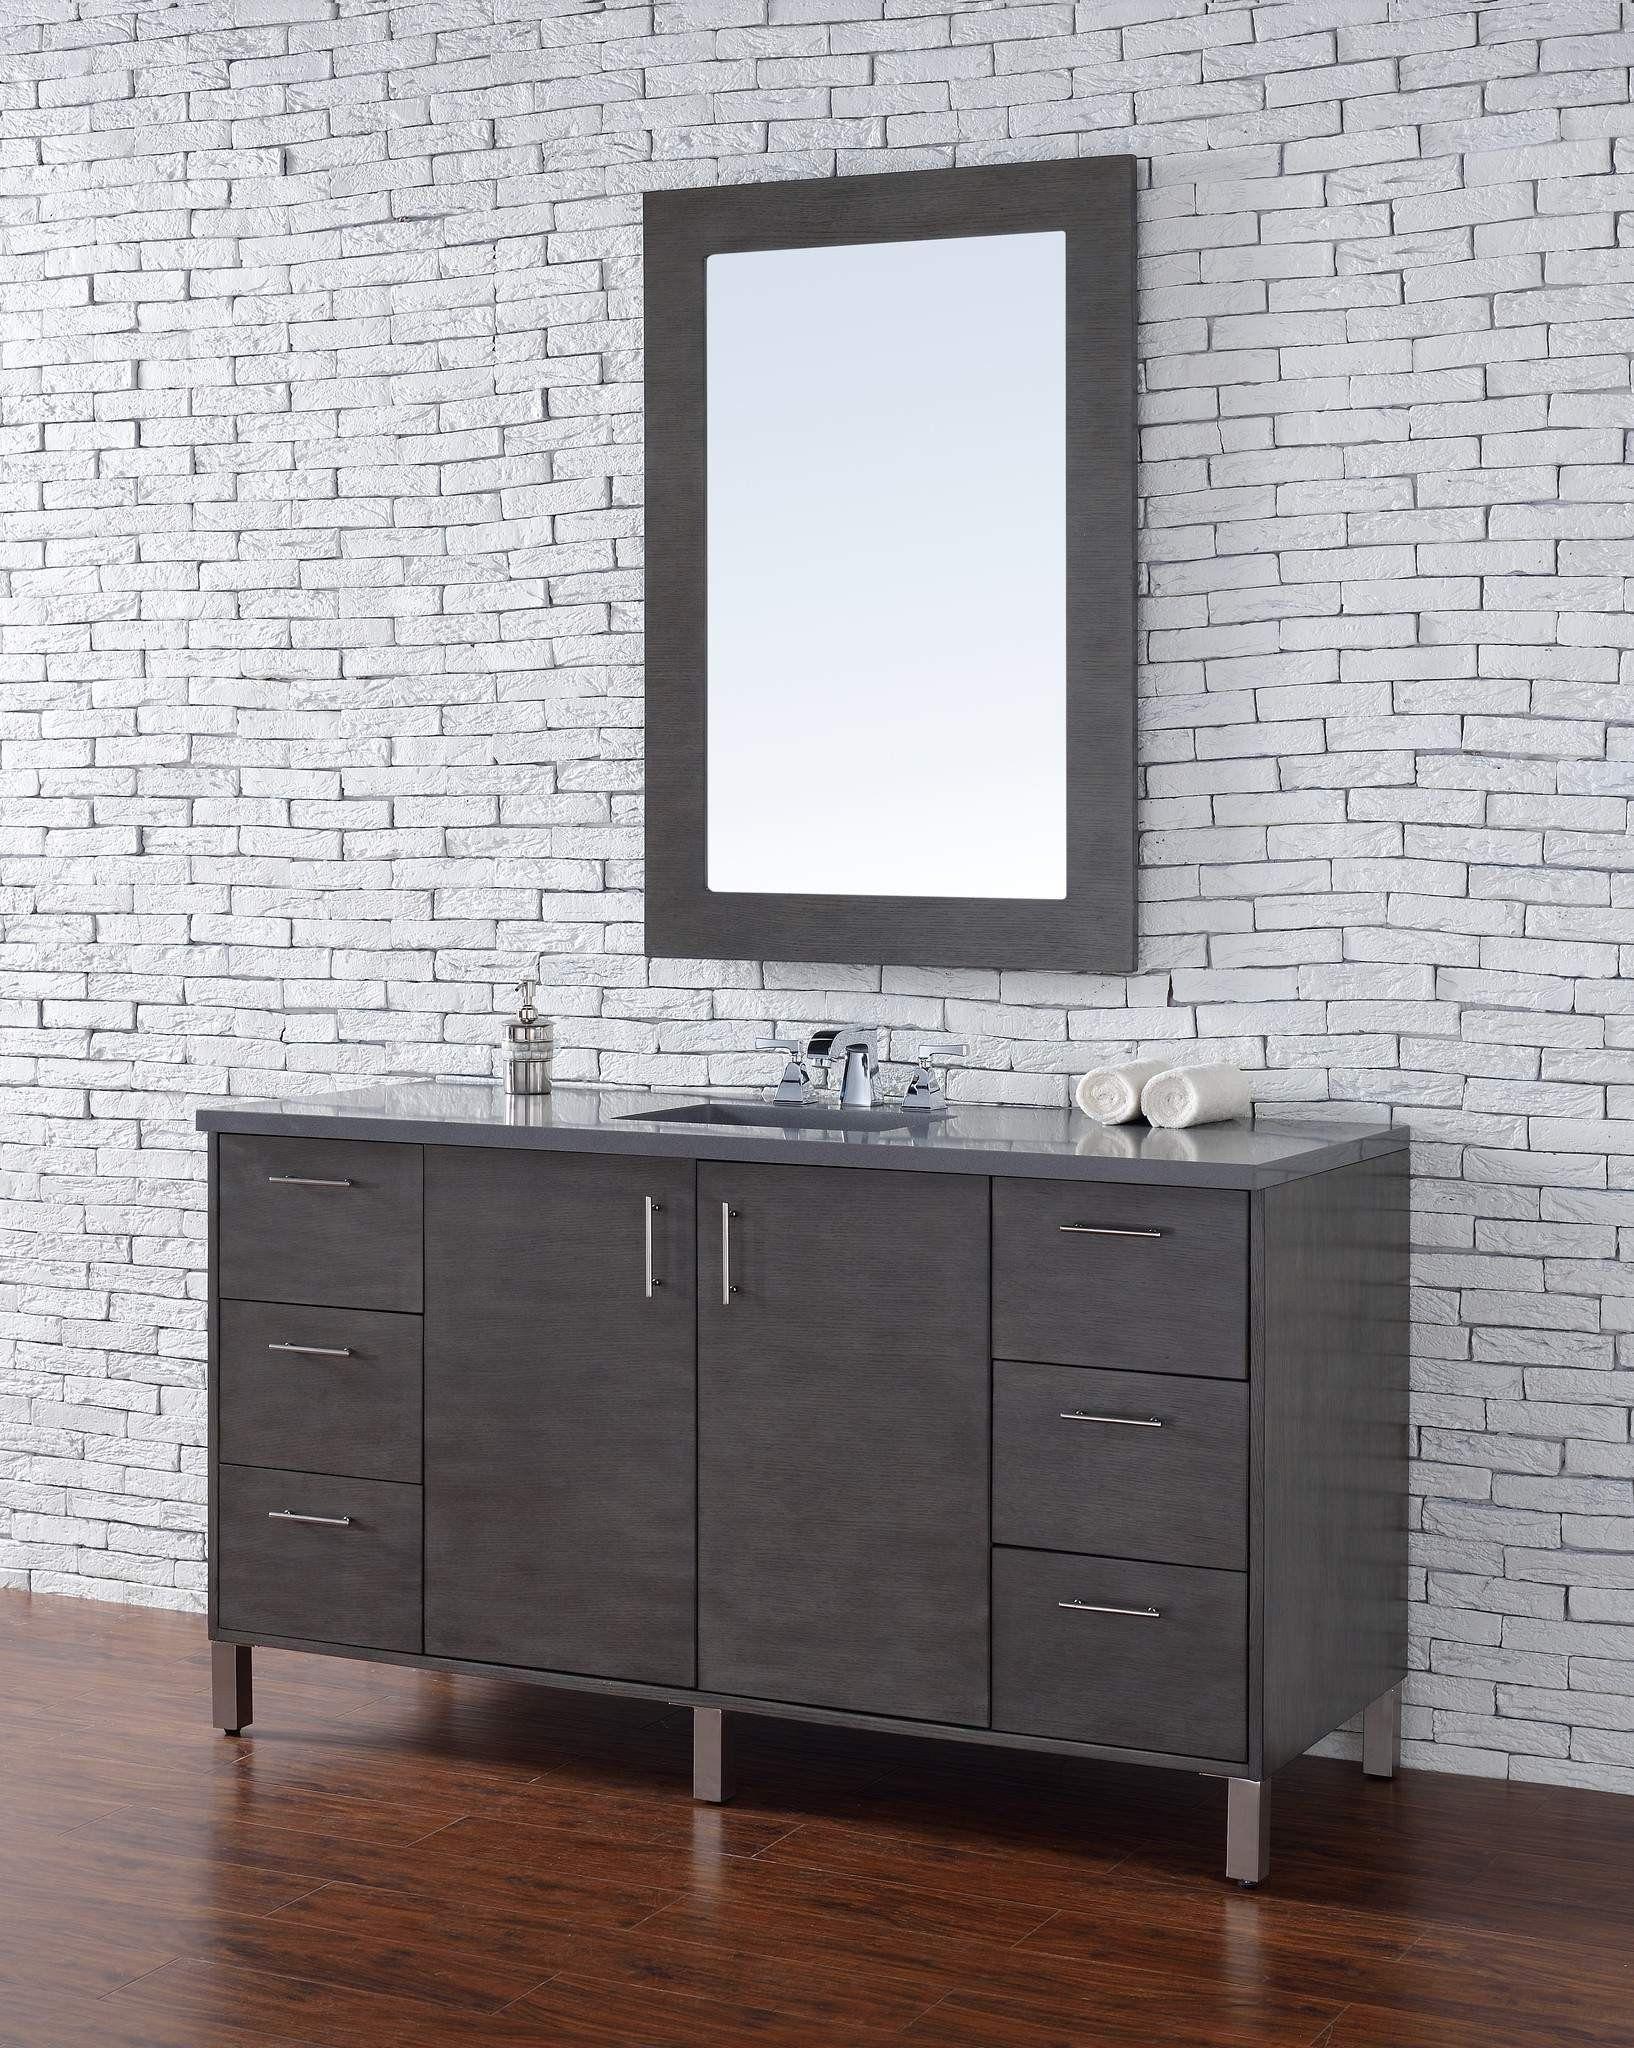 James Martin 850 V60s Sok 3shg Metropolitan 60 Inch Silver Oak Single Vanity With Shadow Gray Quartz Top Single Vanity Modern Bathroom Vanity Marble Vanity Tops [ 2048 x 1634 Pixel ]